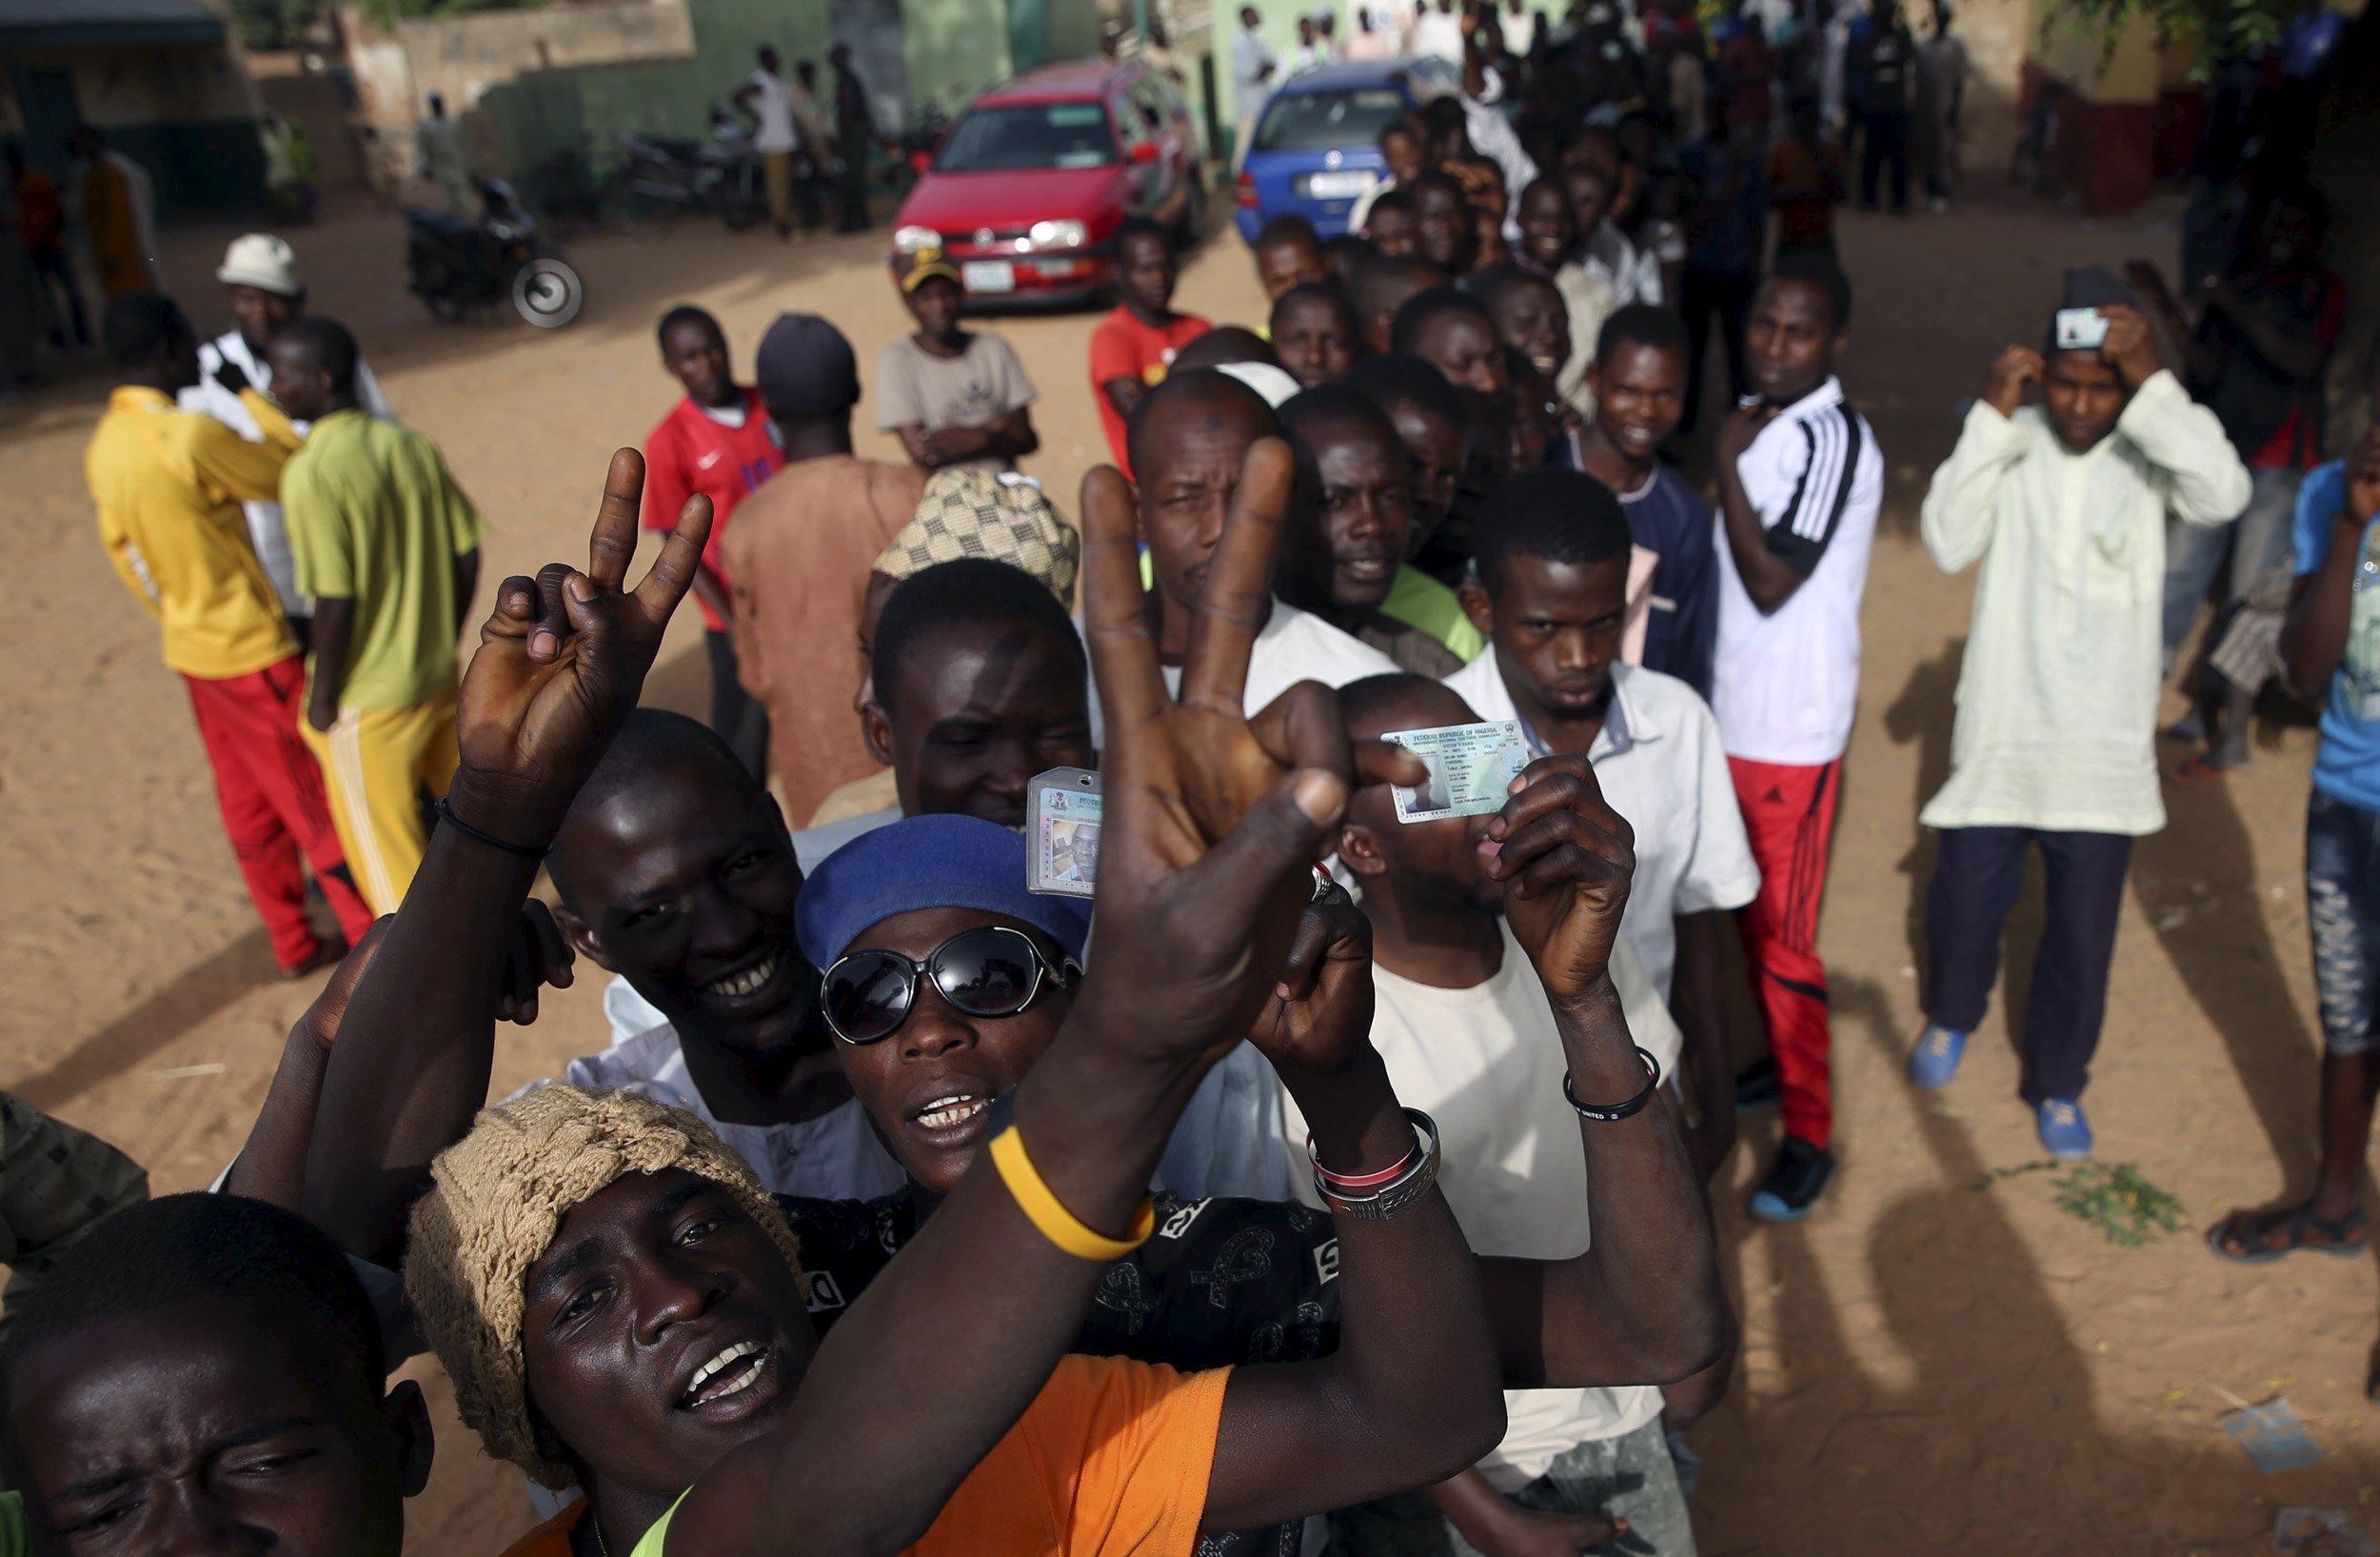 Open Gas Stations Near Me >> Nigerian Elections: Gunmen Kill 15 As Polls Open in Tense Voting - NBC News